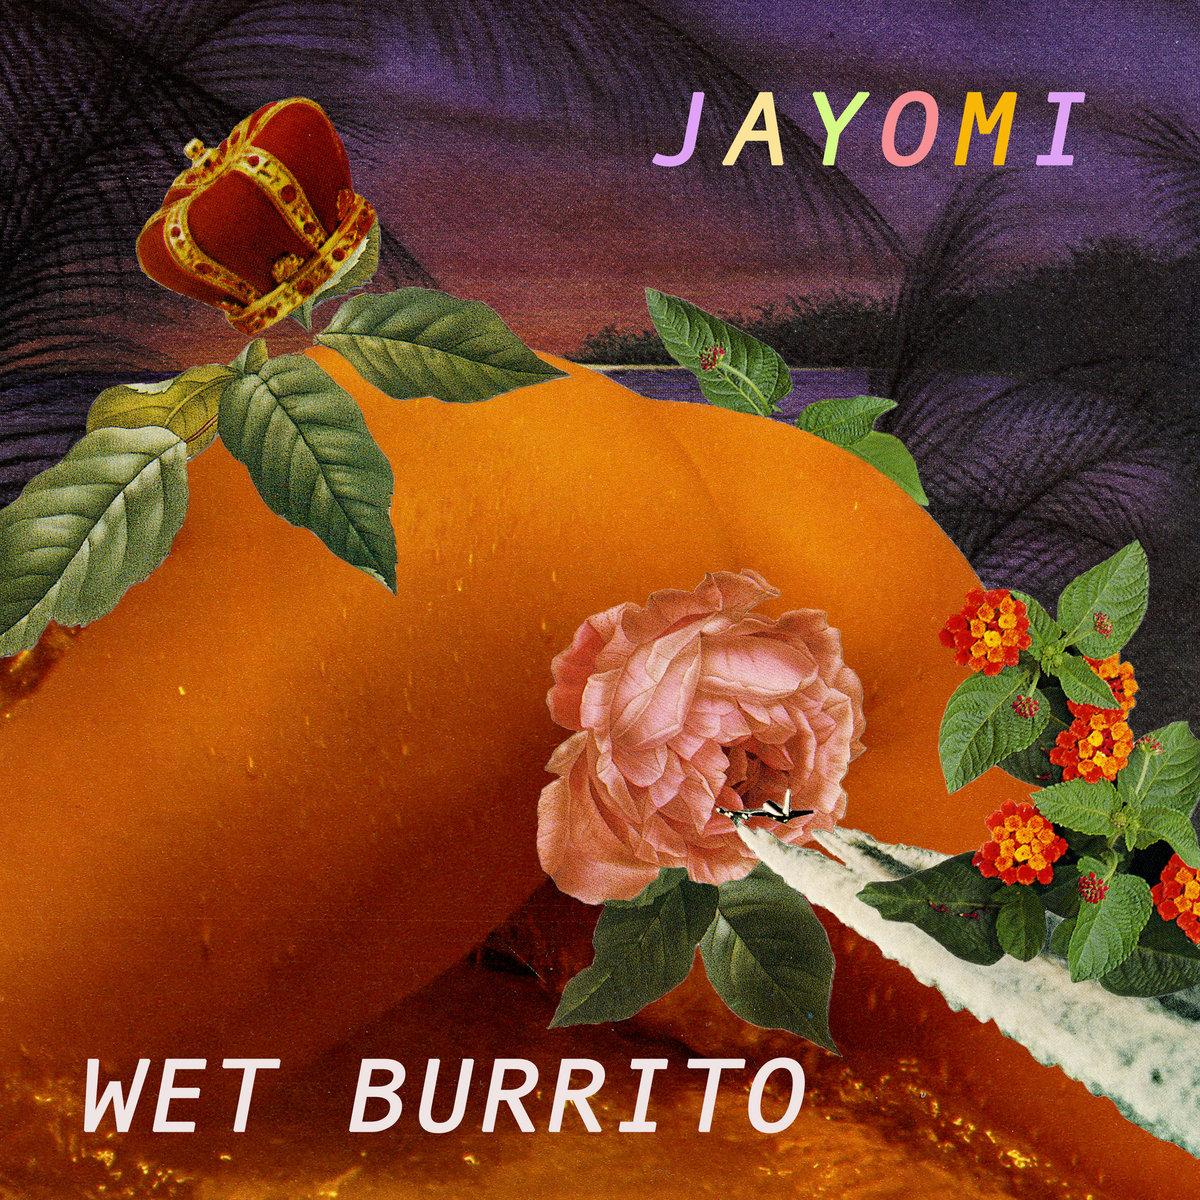 jayomi